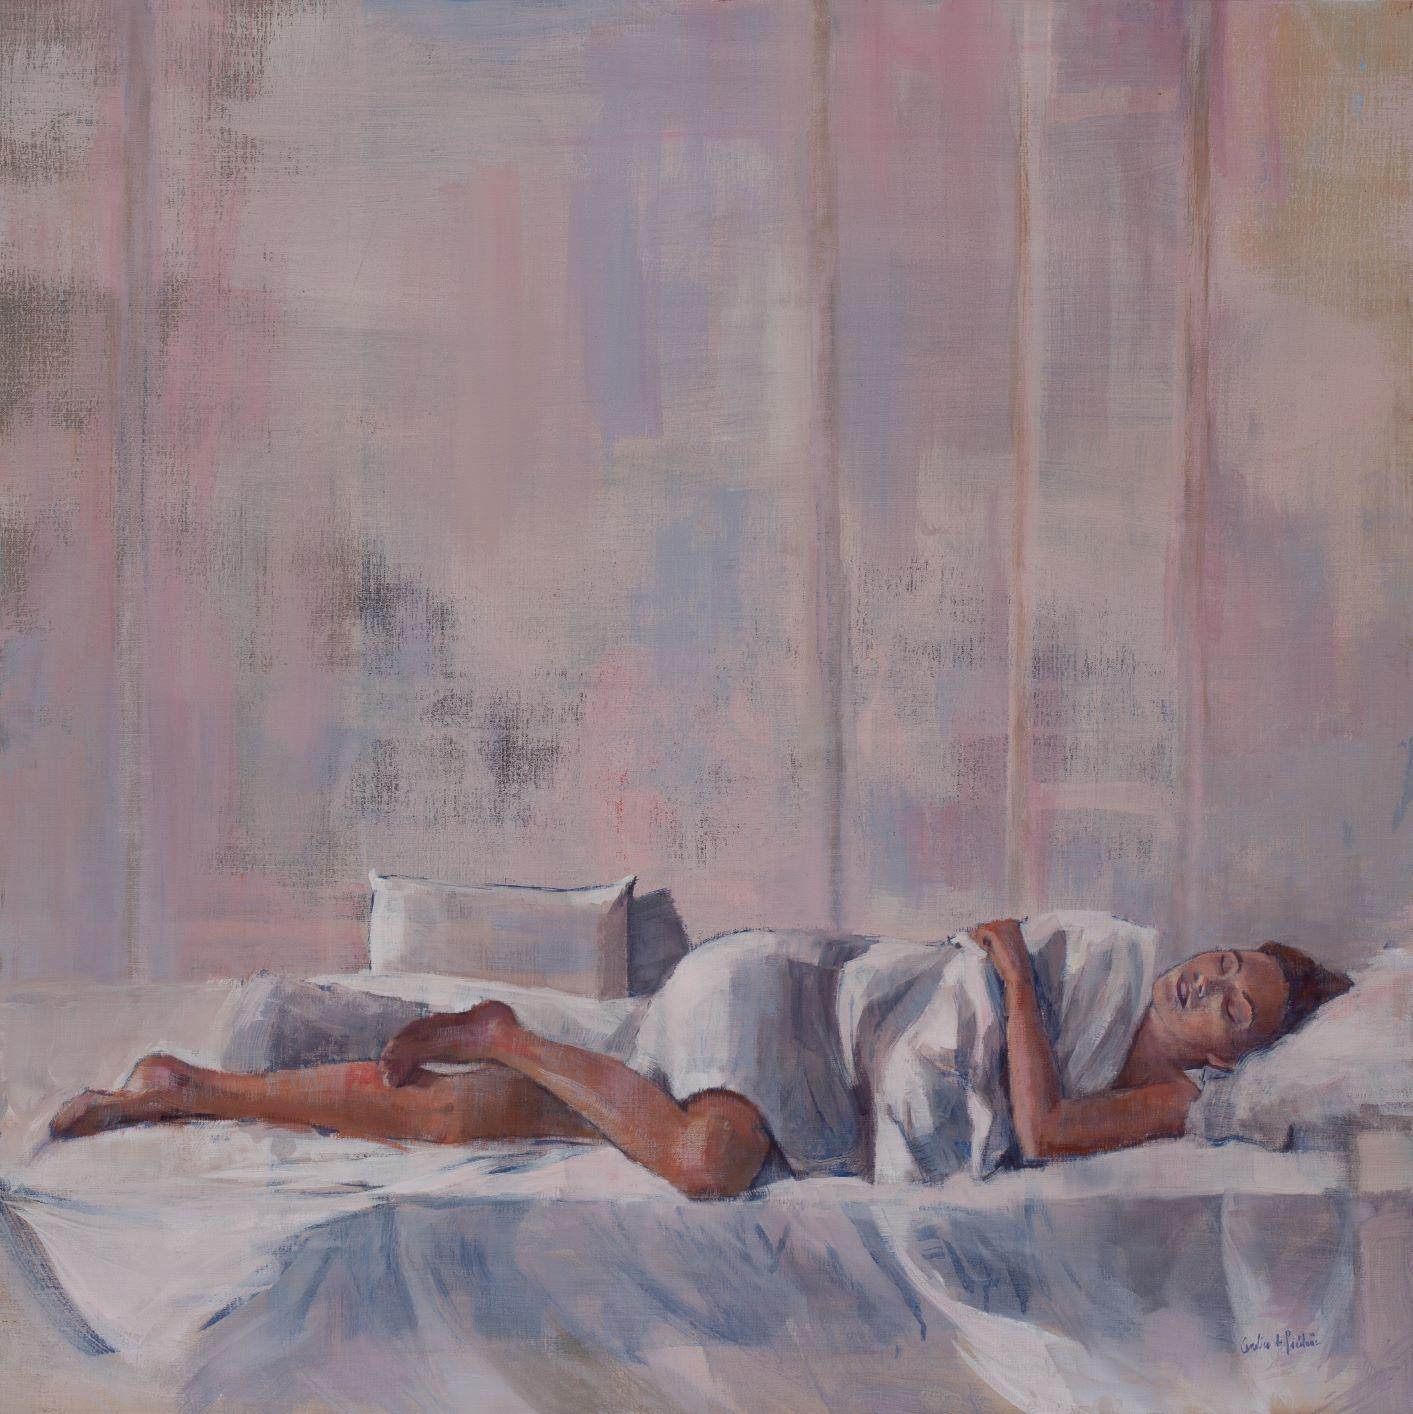 French Contemporary Art by Caroline de Piedoue - Le Lit Blanc